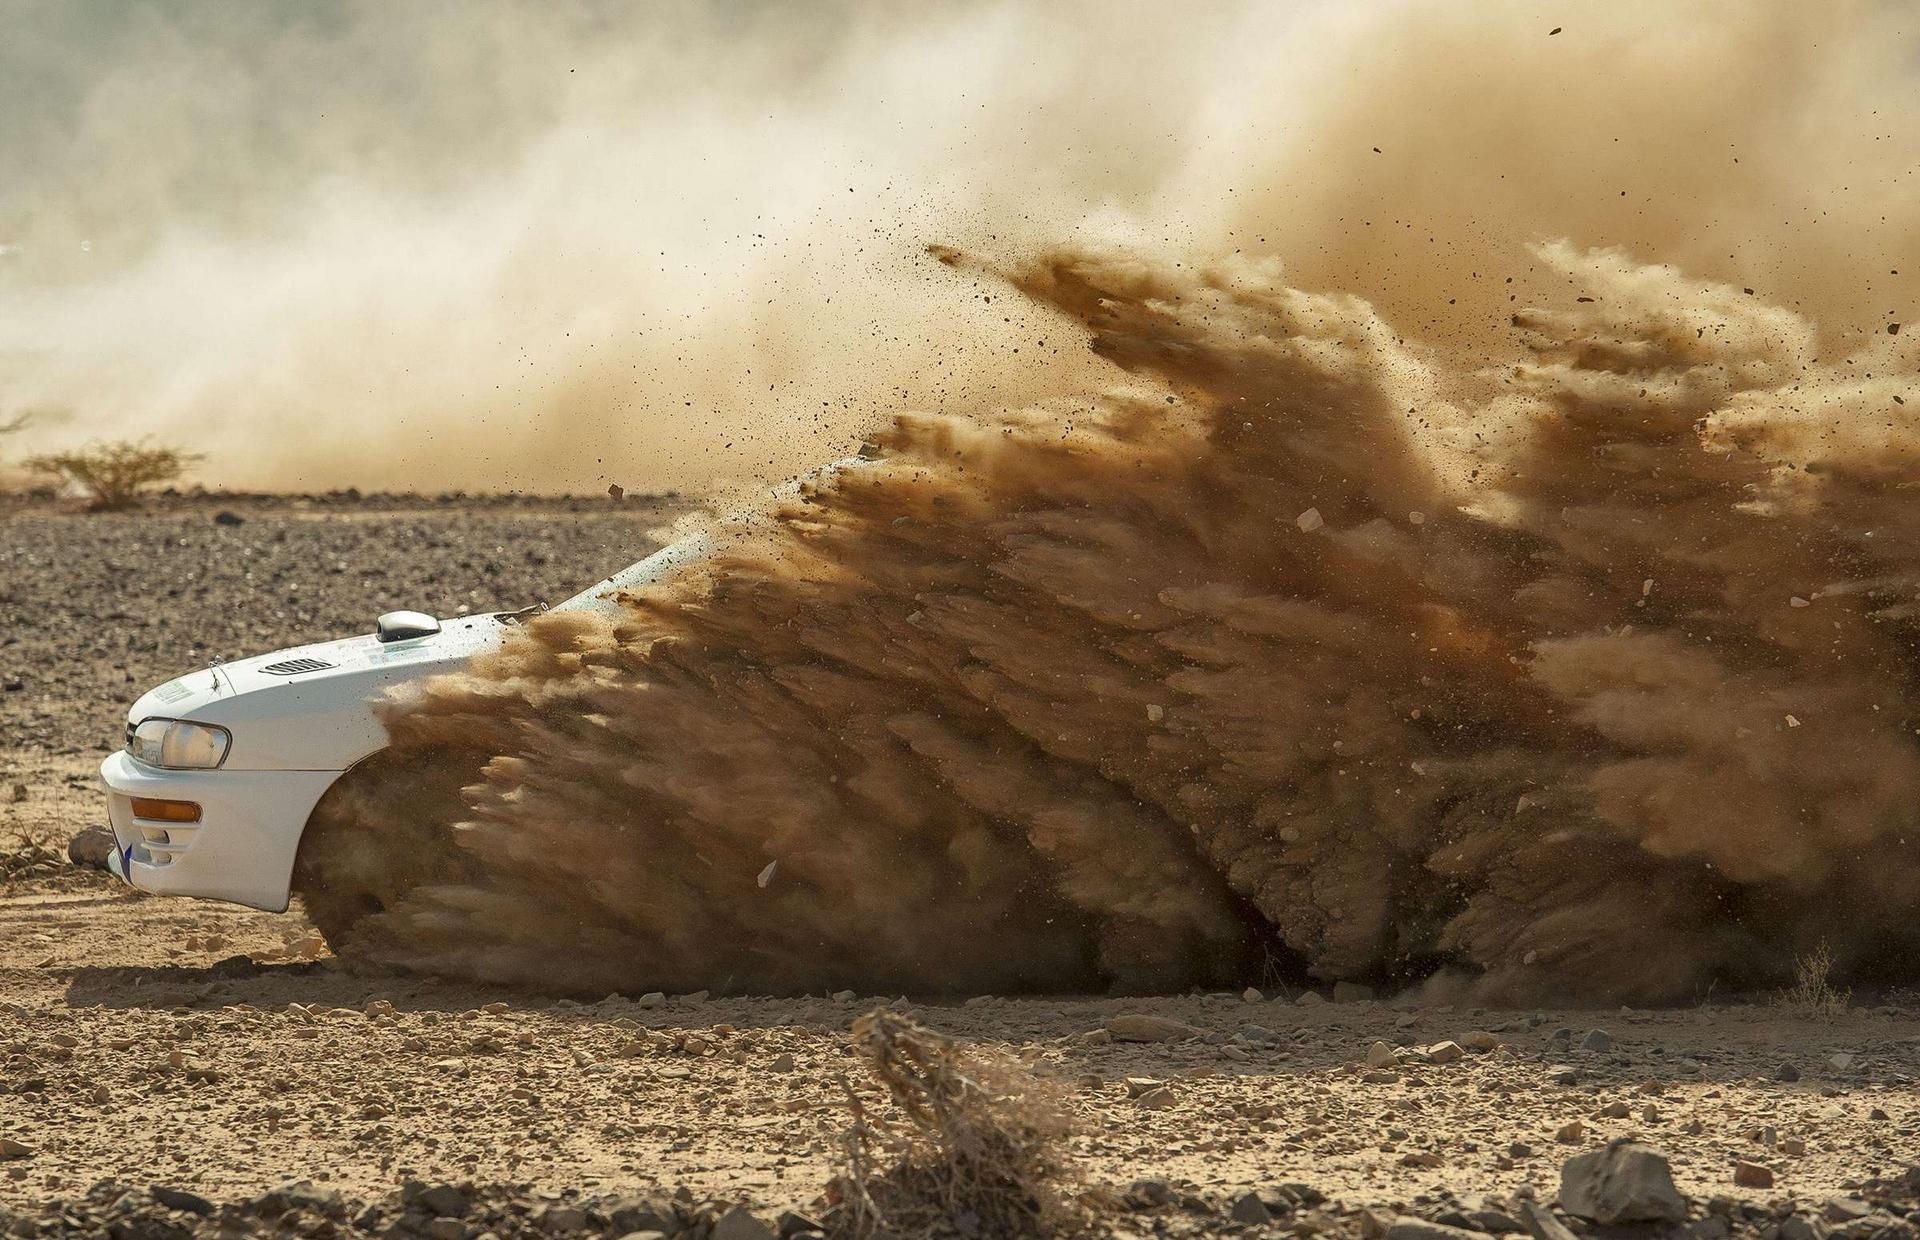 Photograph by Abdulrahman Alhinai